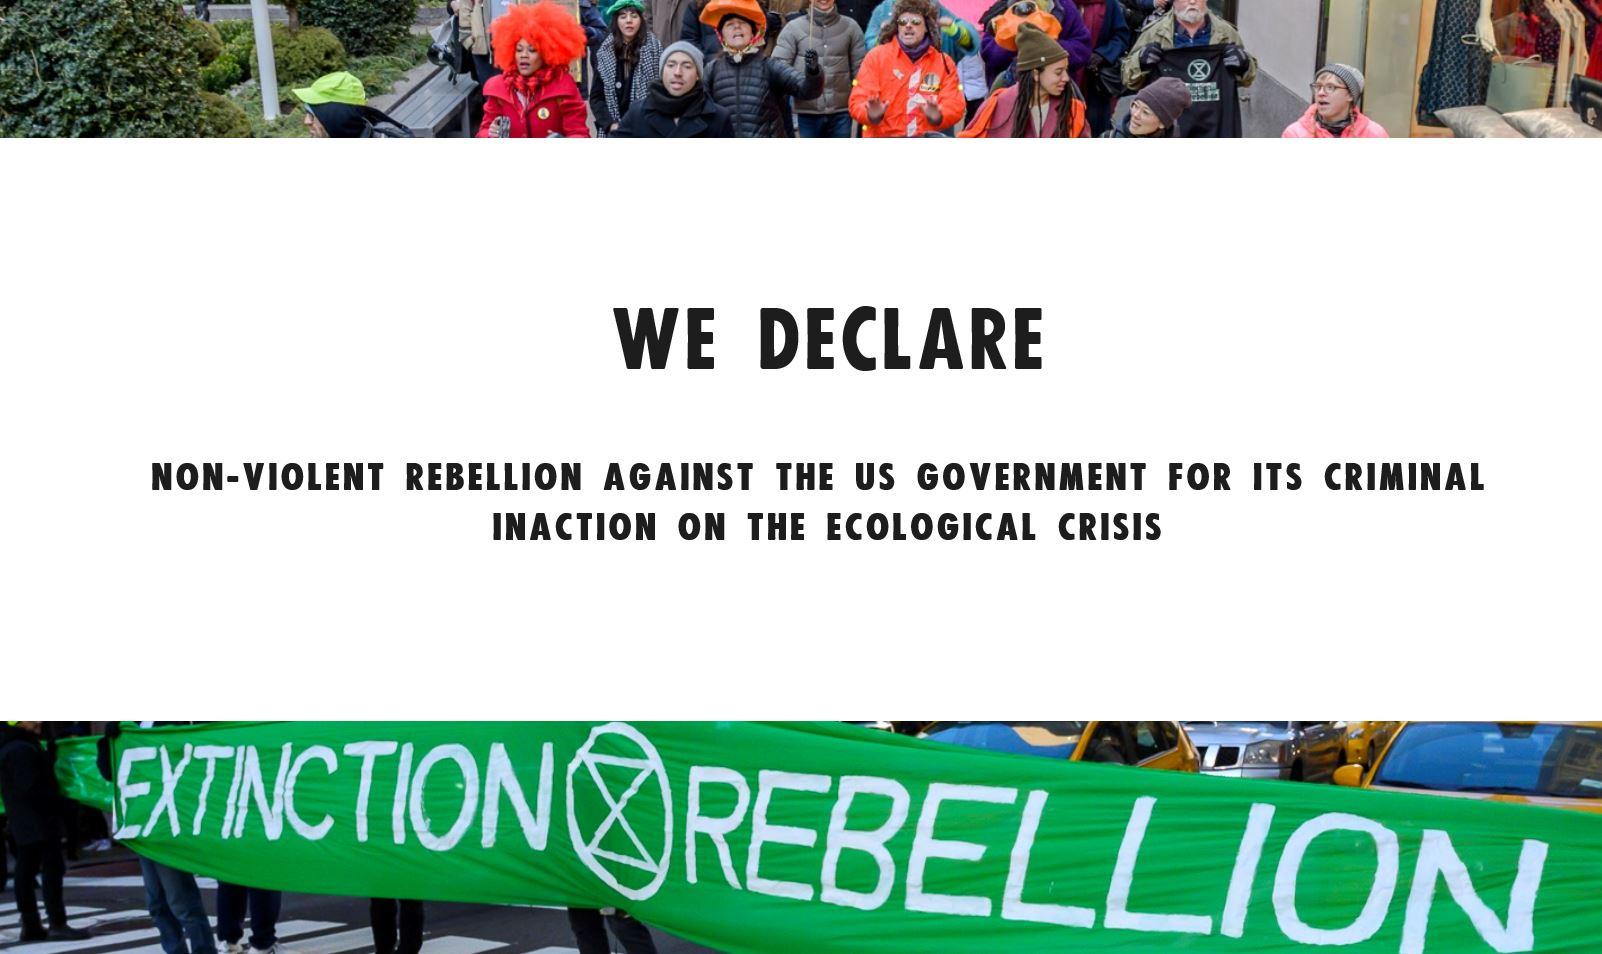 extinction rebellion - photo #2